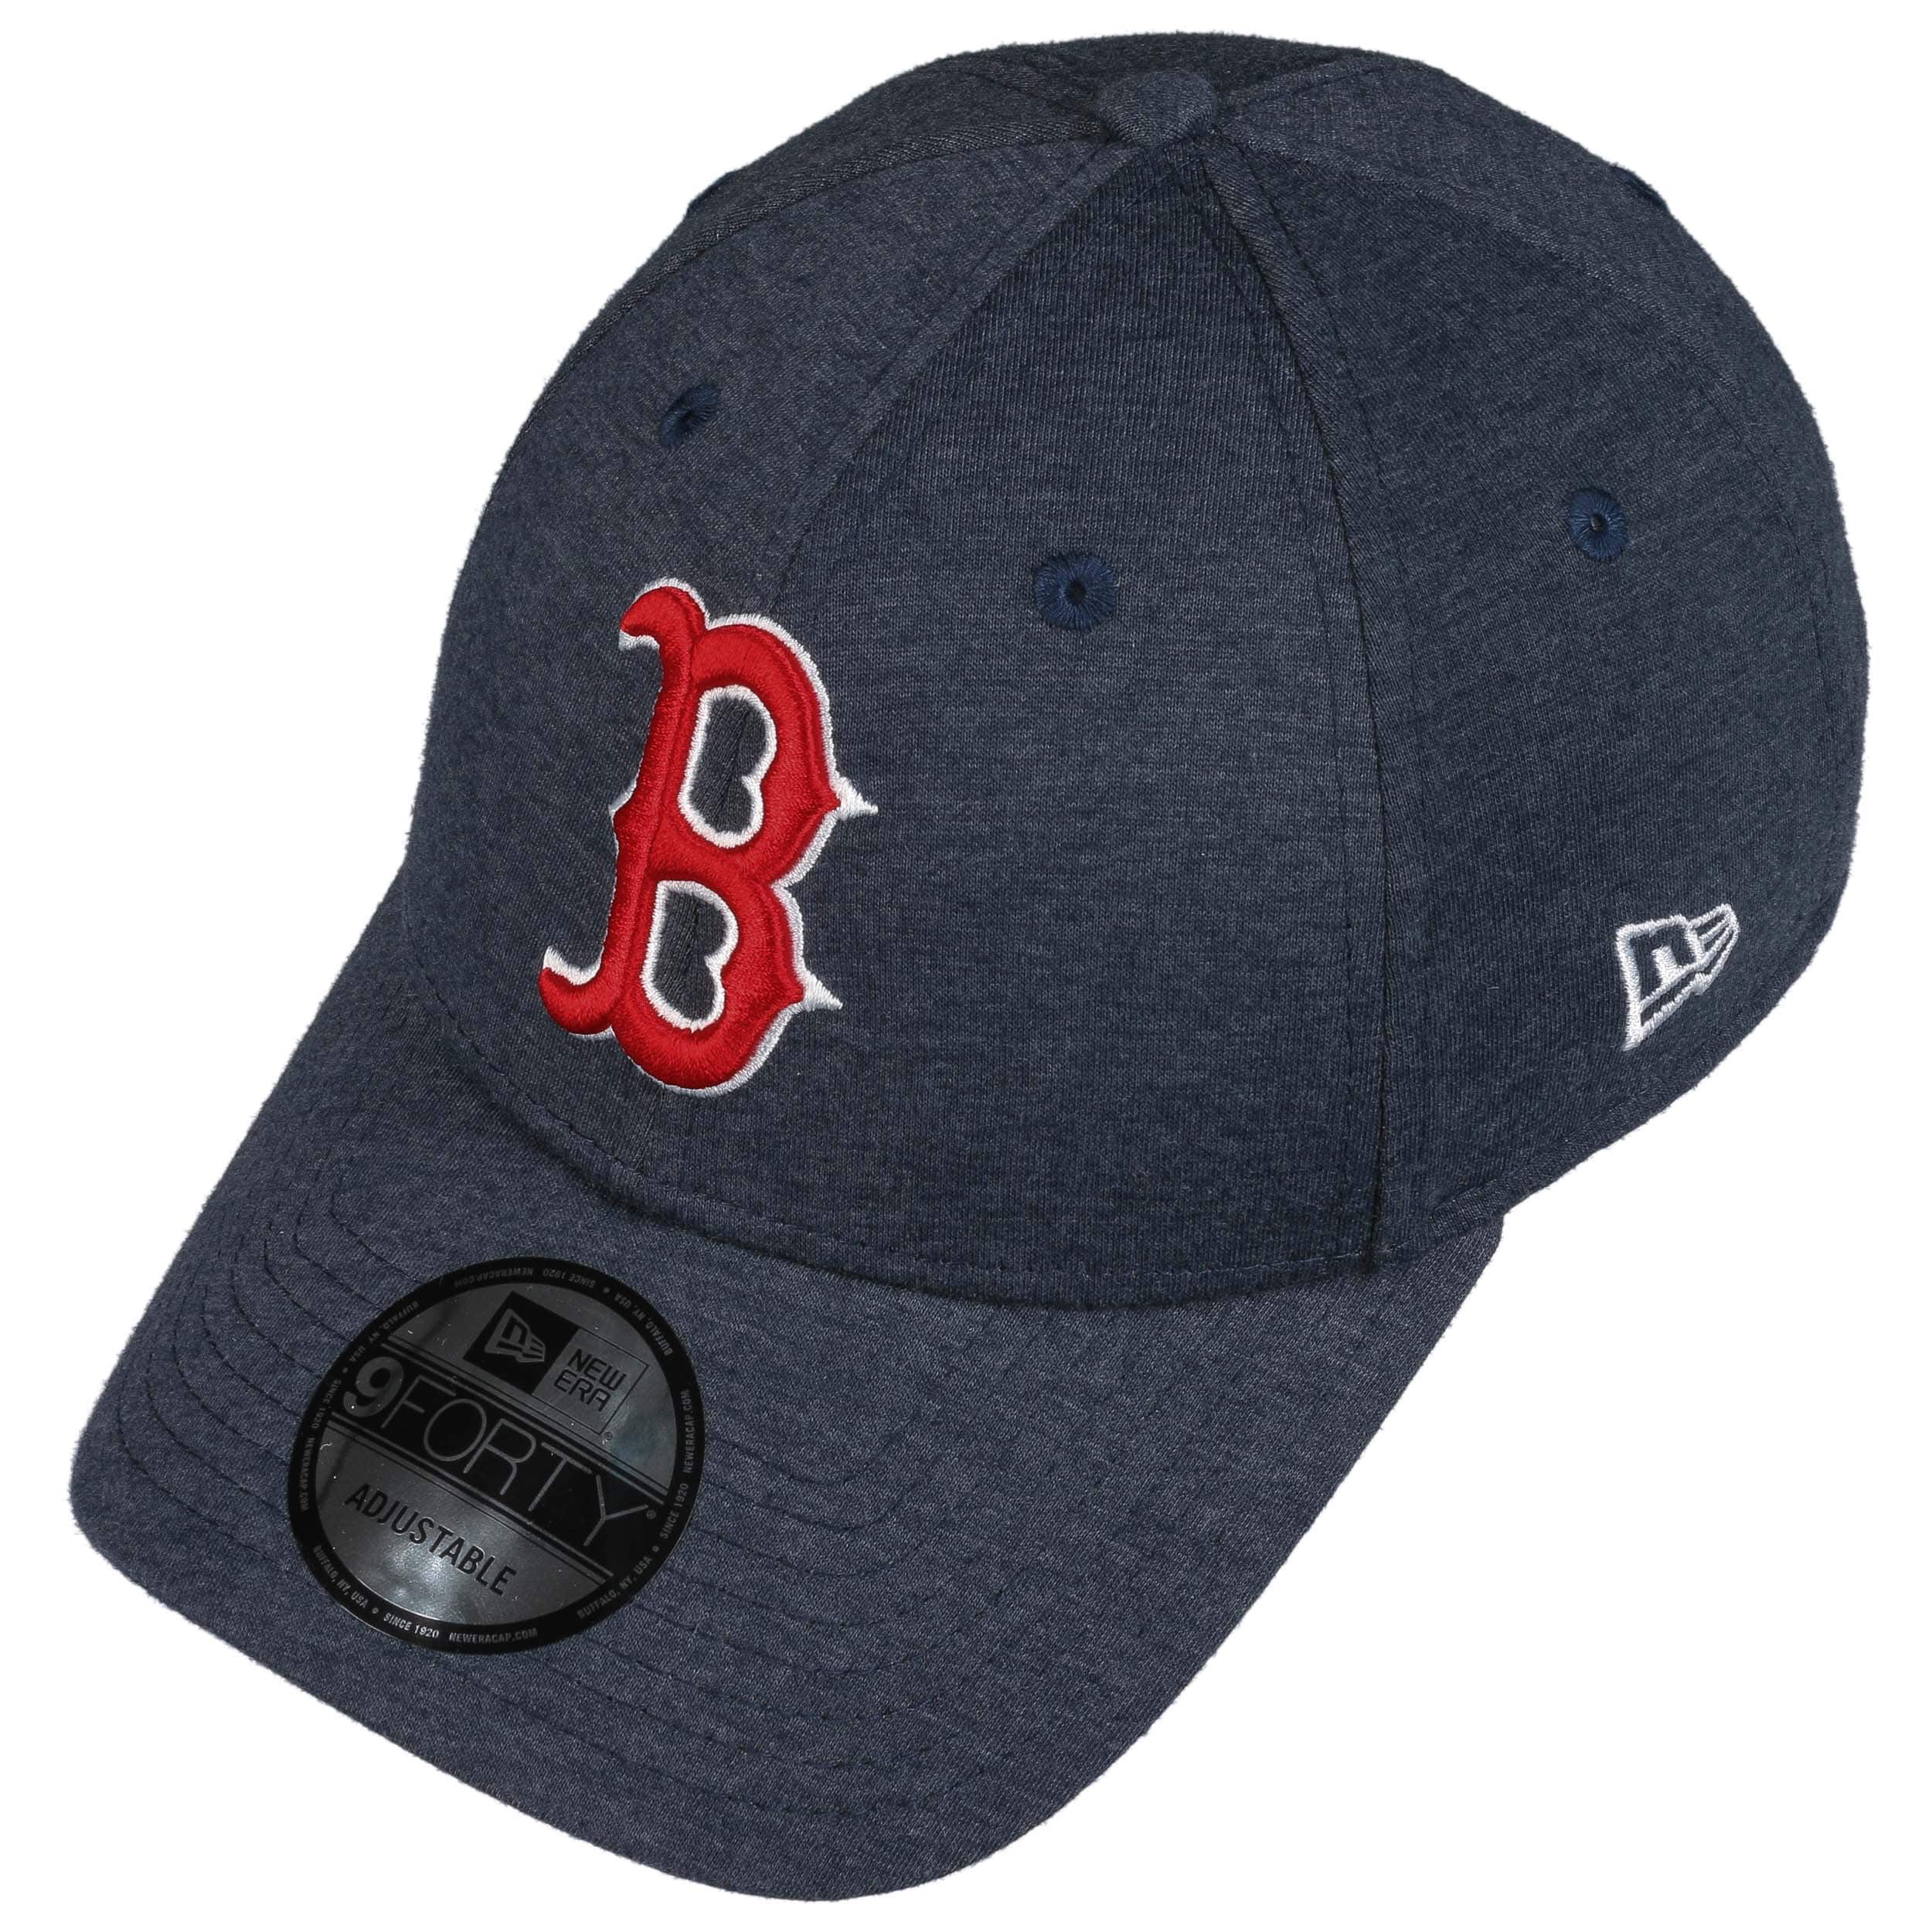 Gorra 9Forty Winterised Red Sox by New Era - Gorras - sombreroshop.es fc9c363bd0c